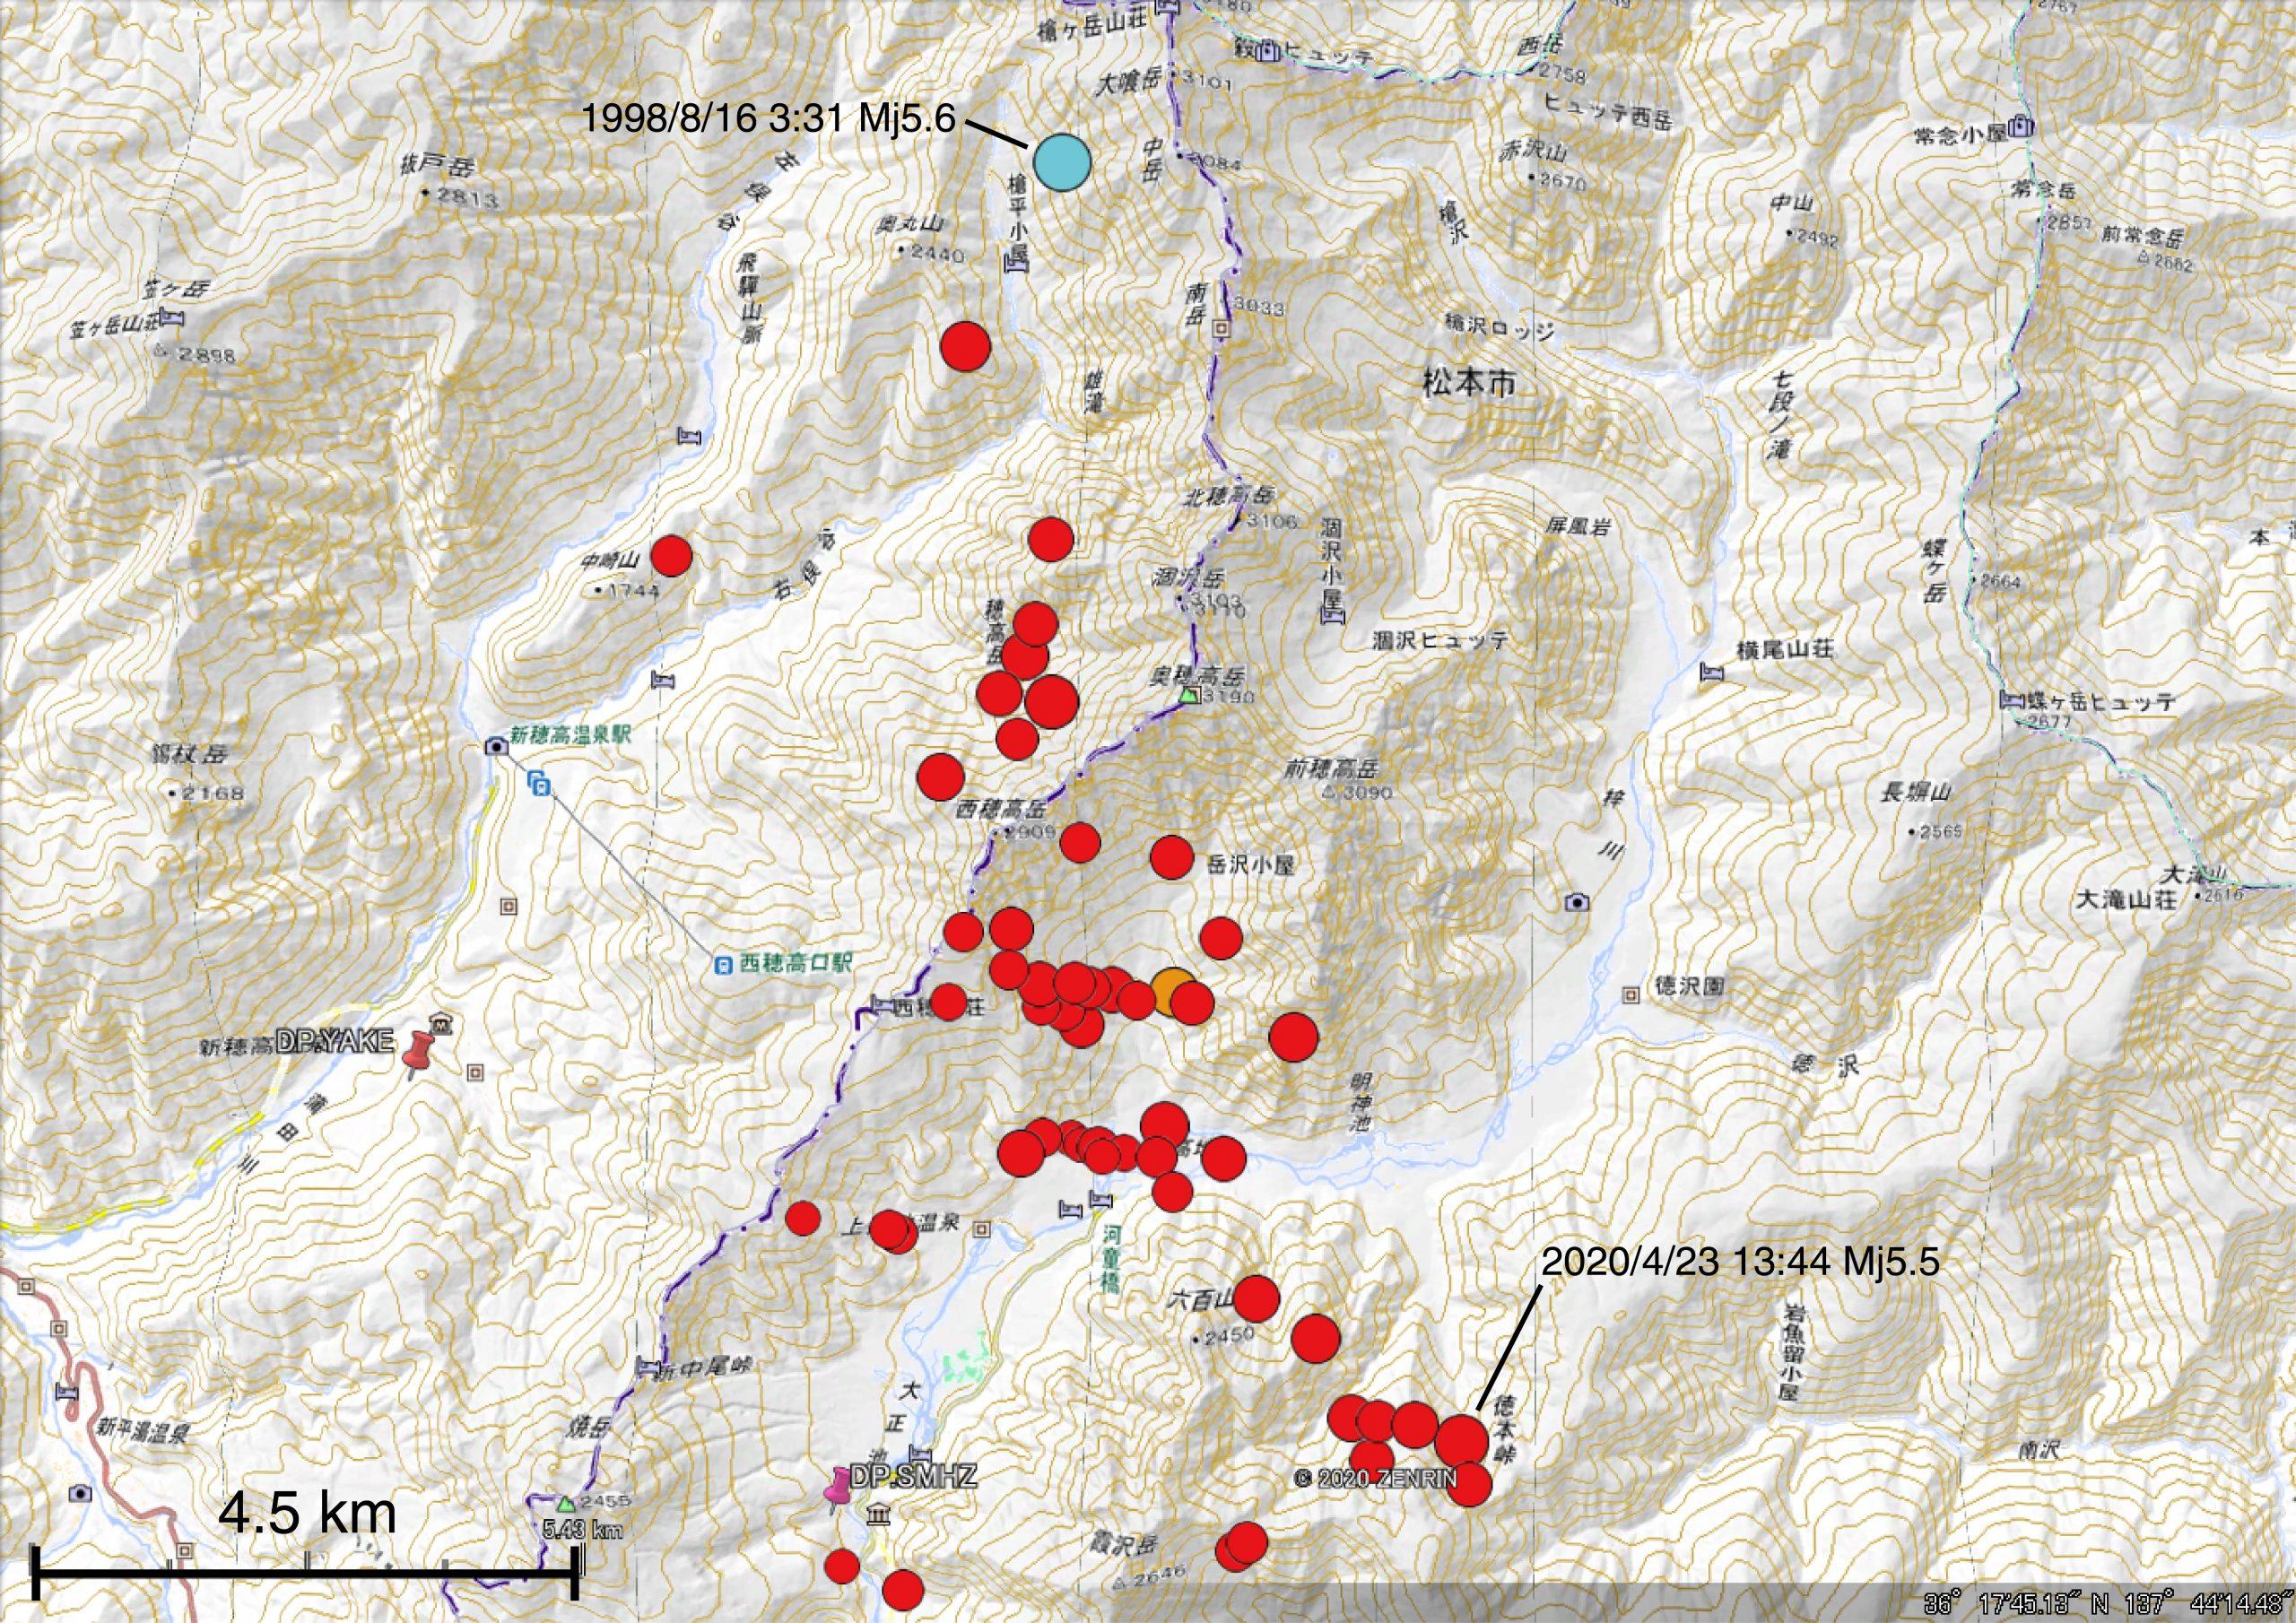 DP.YAKE観測点で計測震度3相当以上を観測した地震の分布